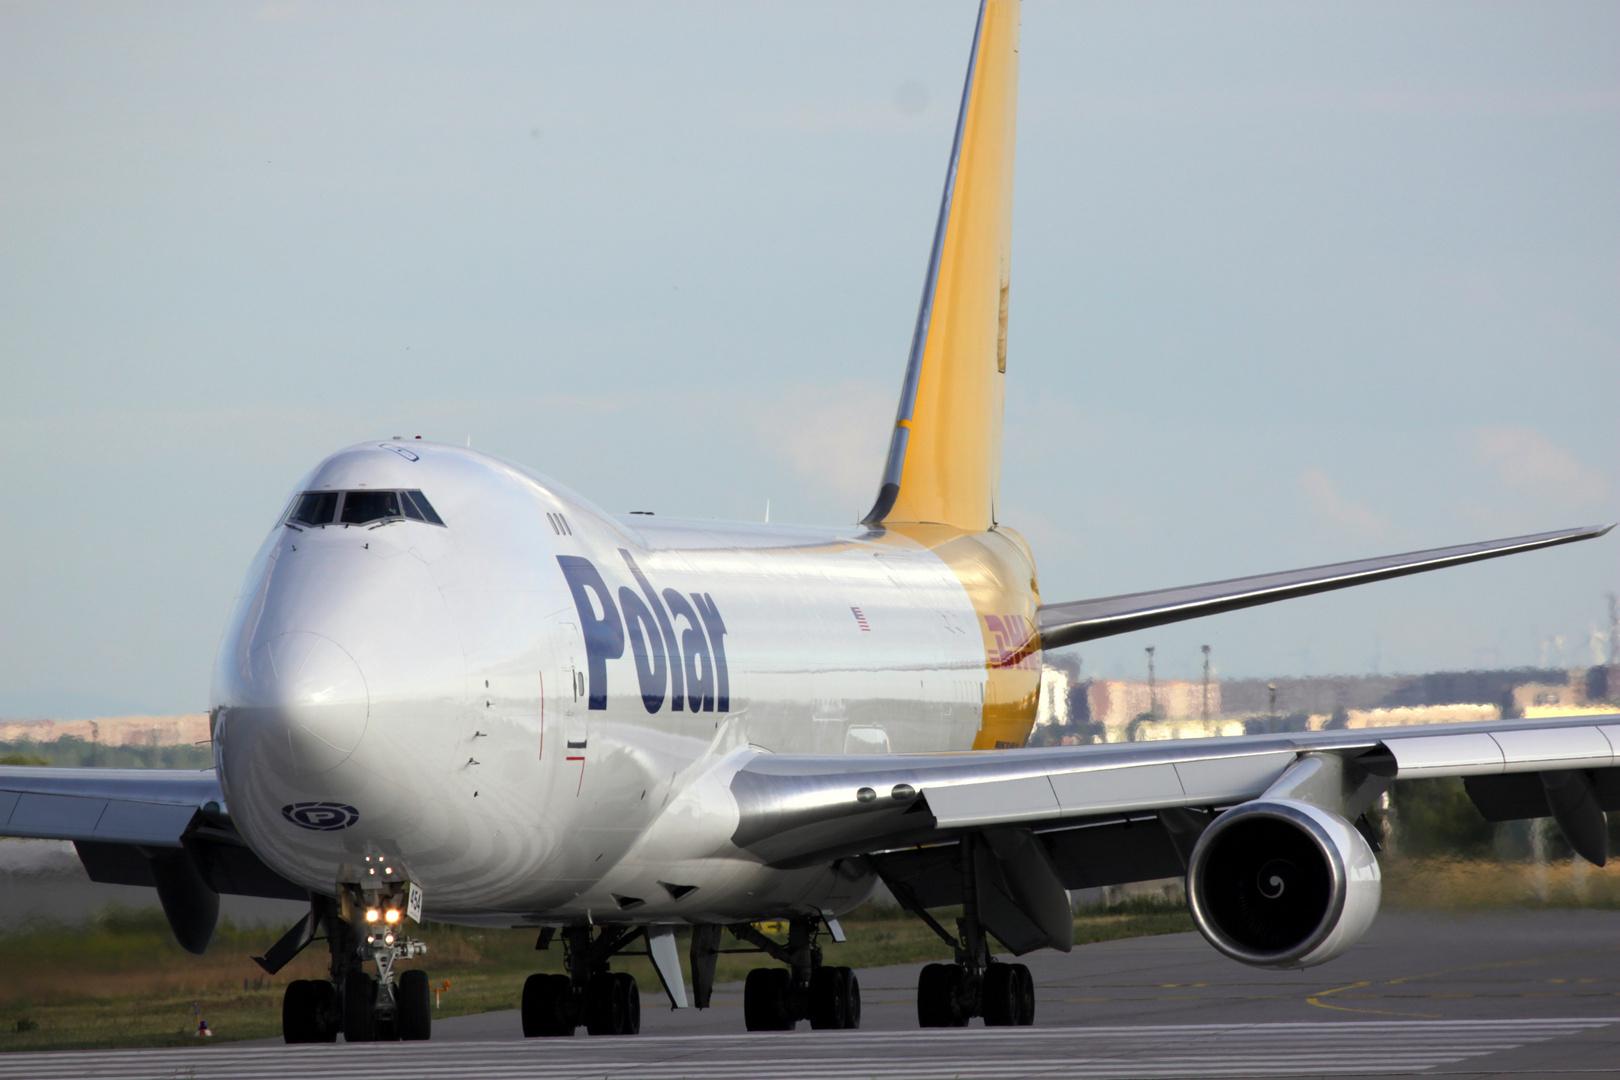 Polar Air Cargo Boeing 747-46NF(SCD) N454PA at LEJ